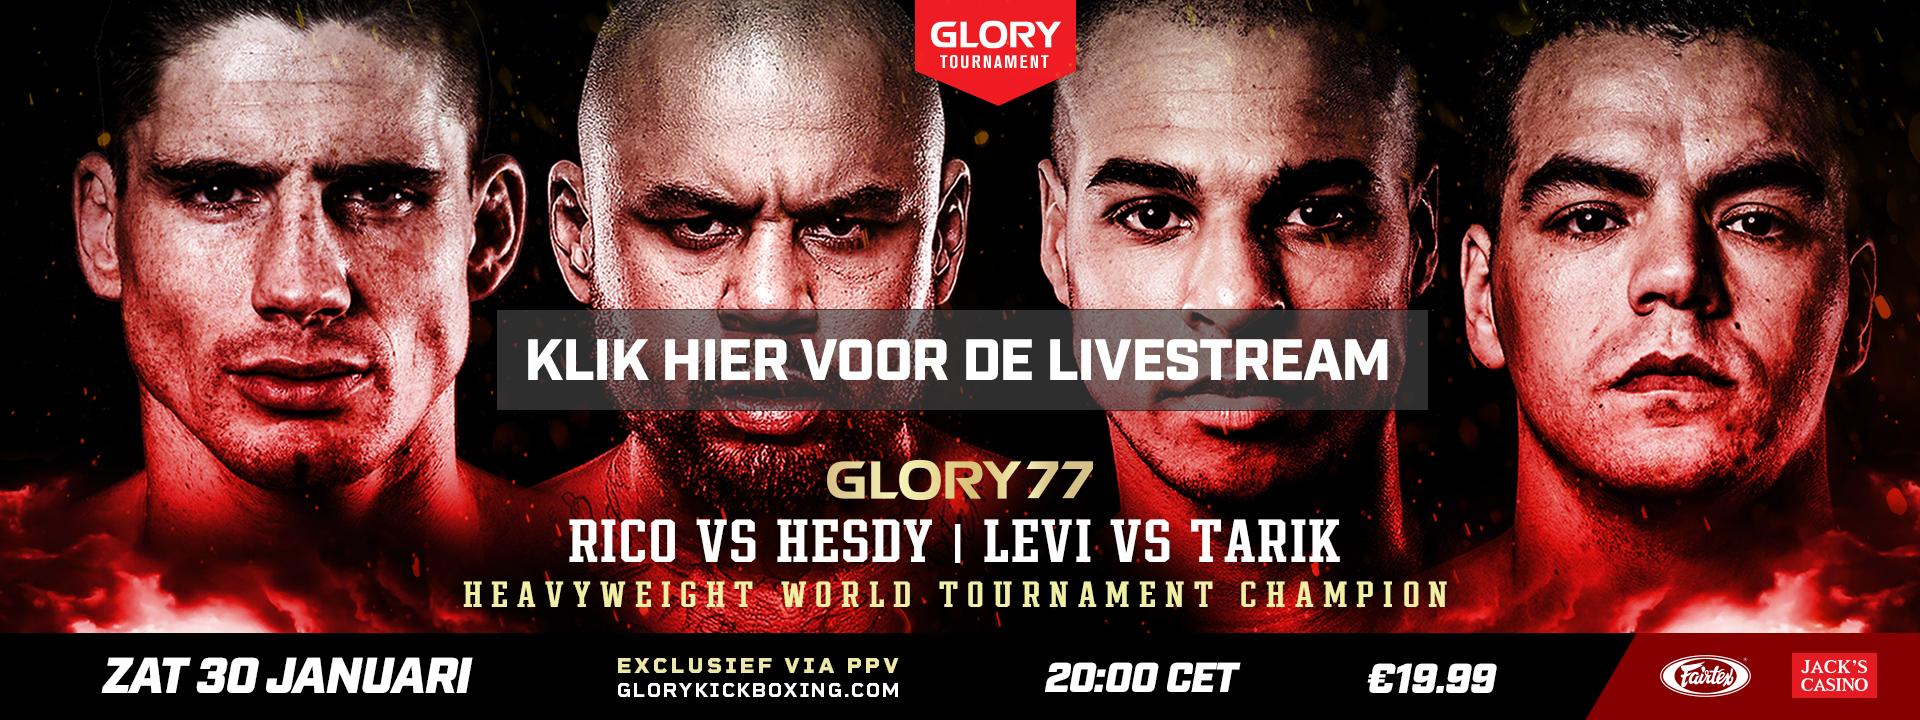 GLORY 77 NL